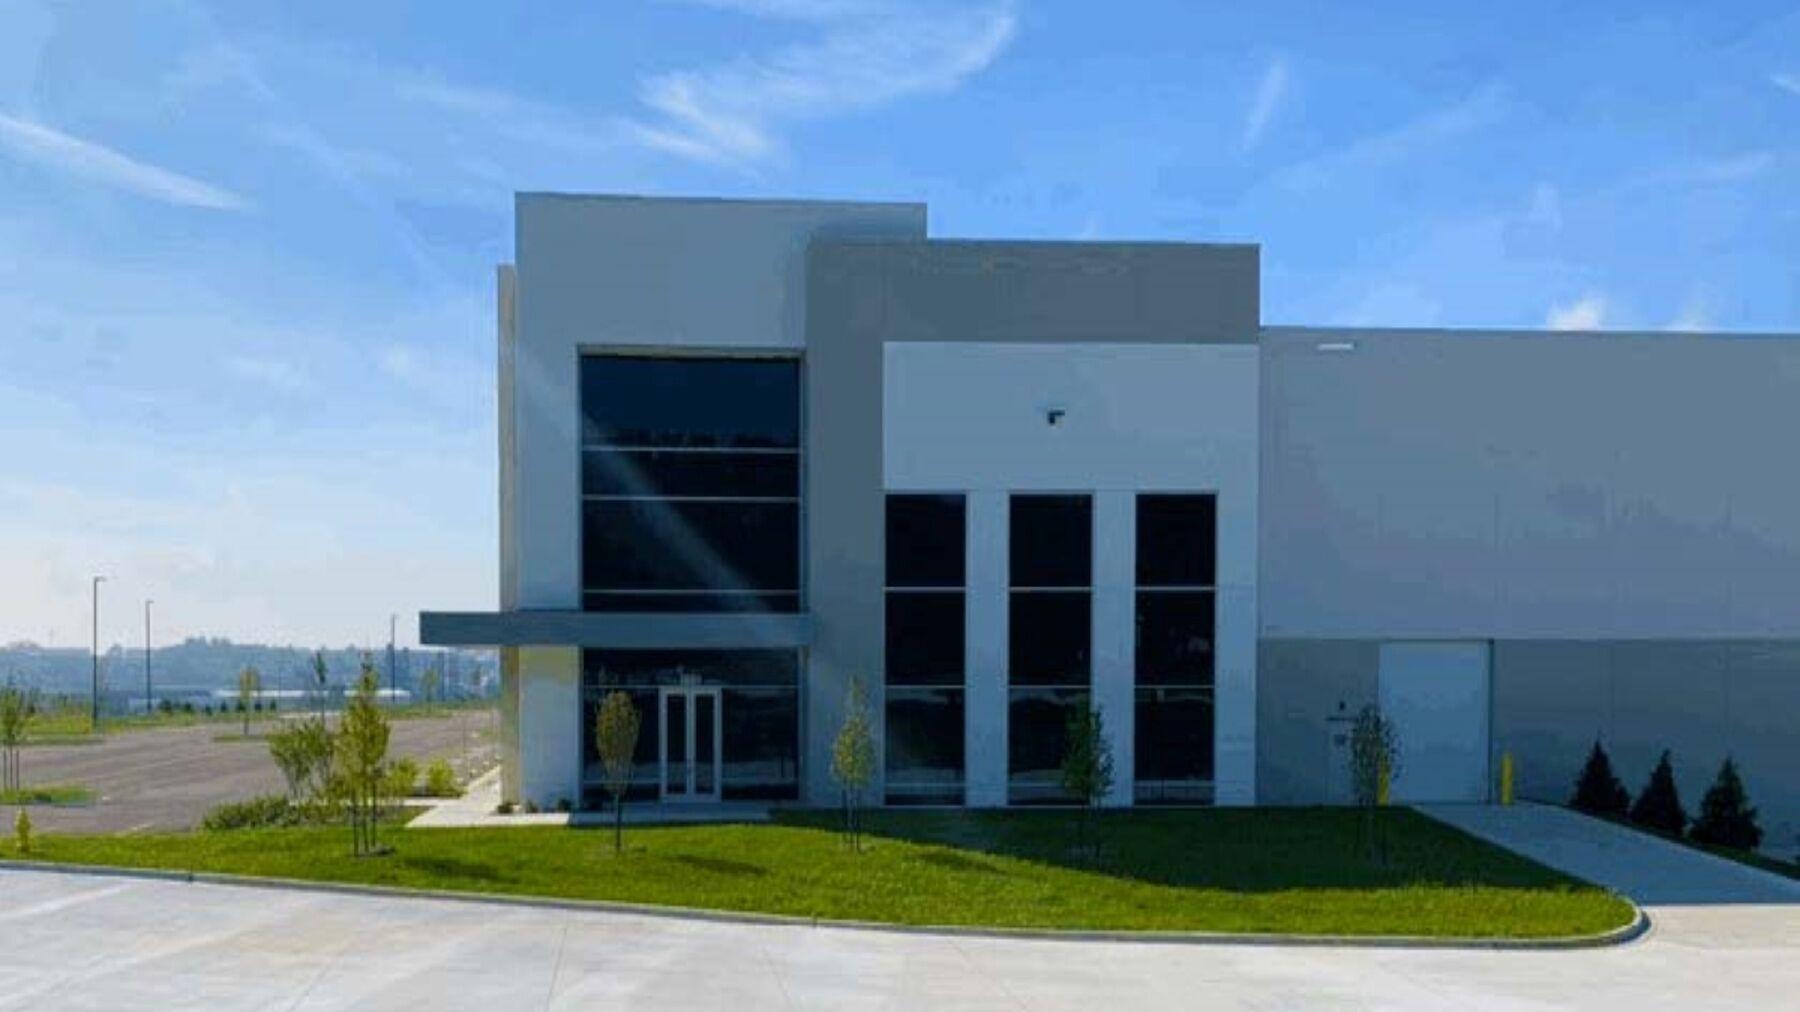 DPM-Prologis-Romeoville-1001-Bluff-Rd_Building-Image.jpg